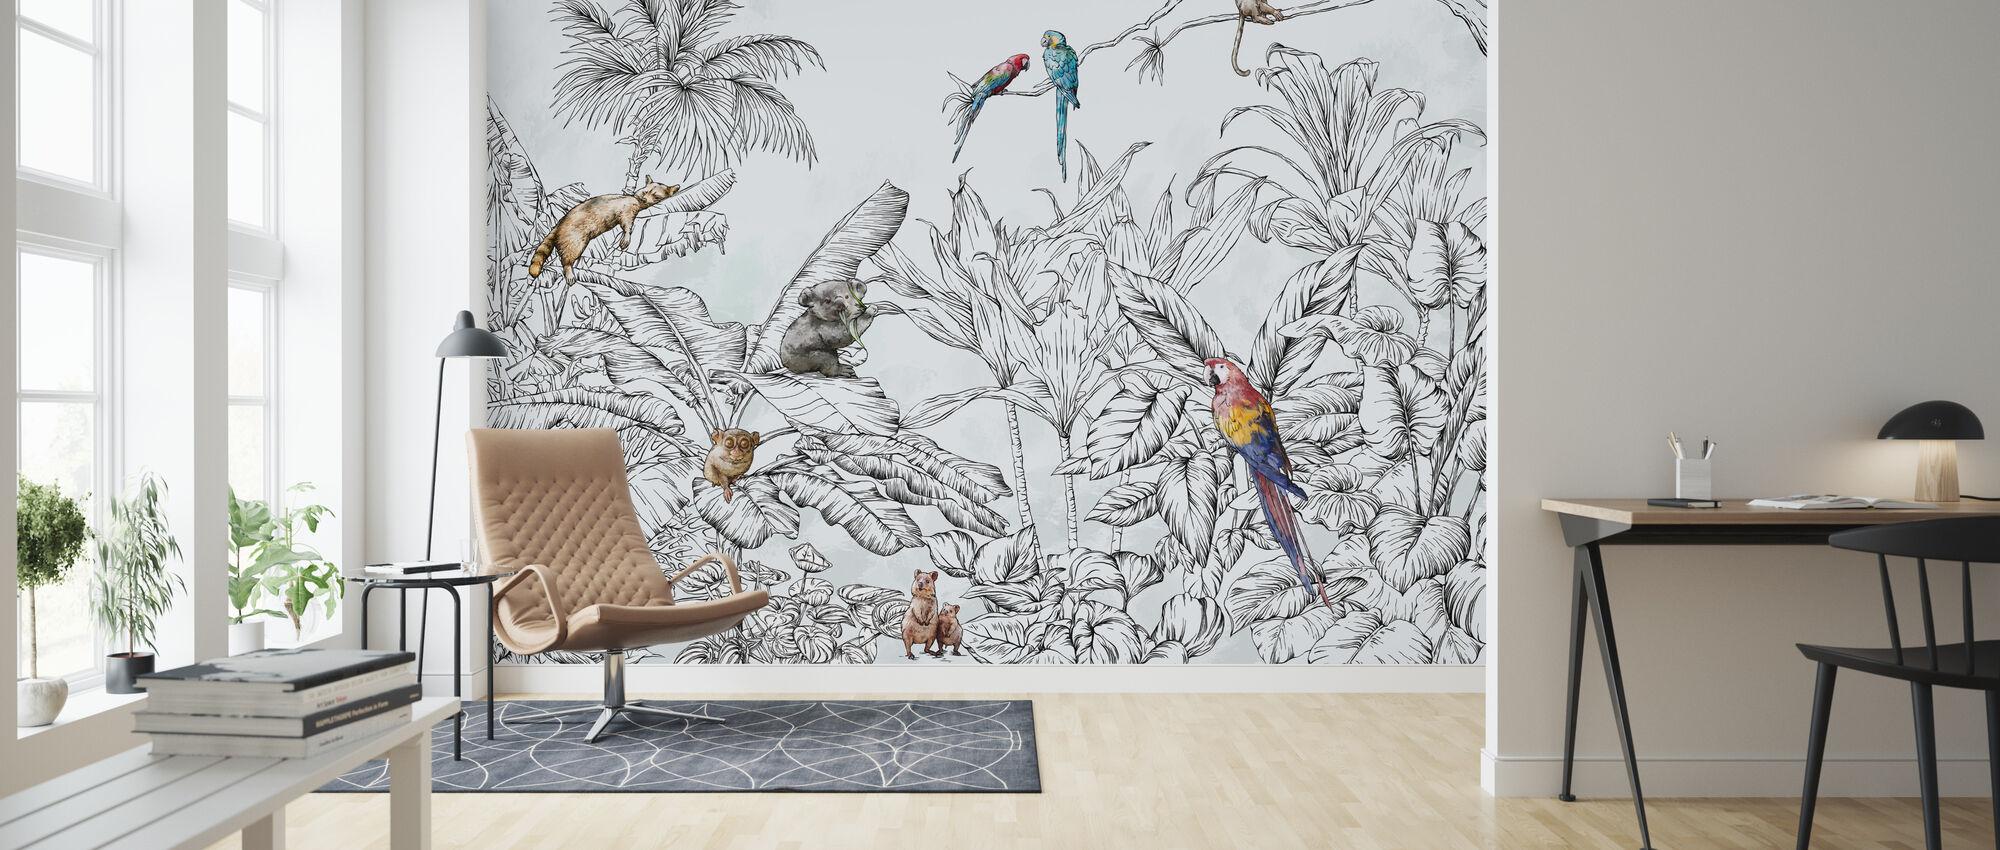 Hello Jungle Animals - Wallpaper - Living Room